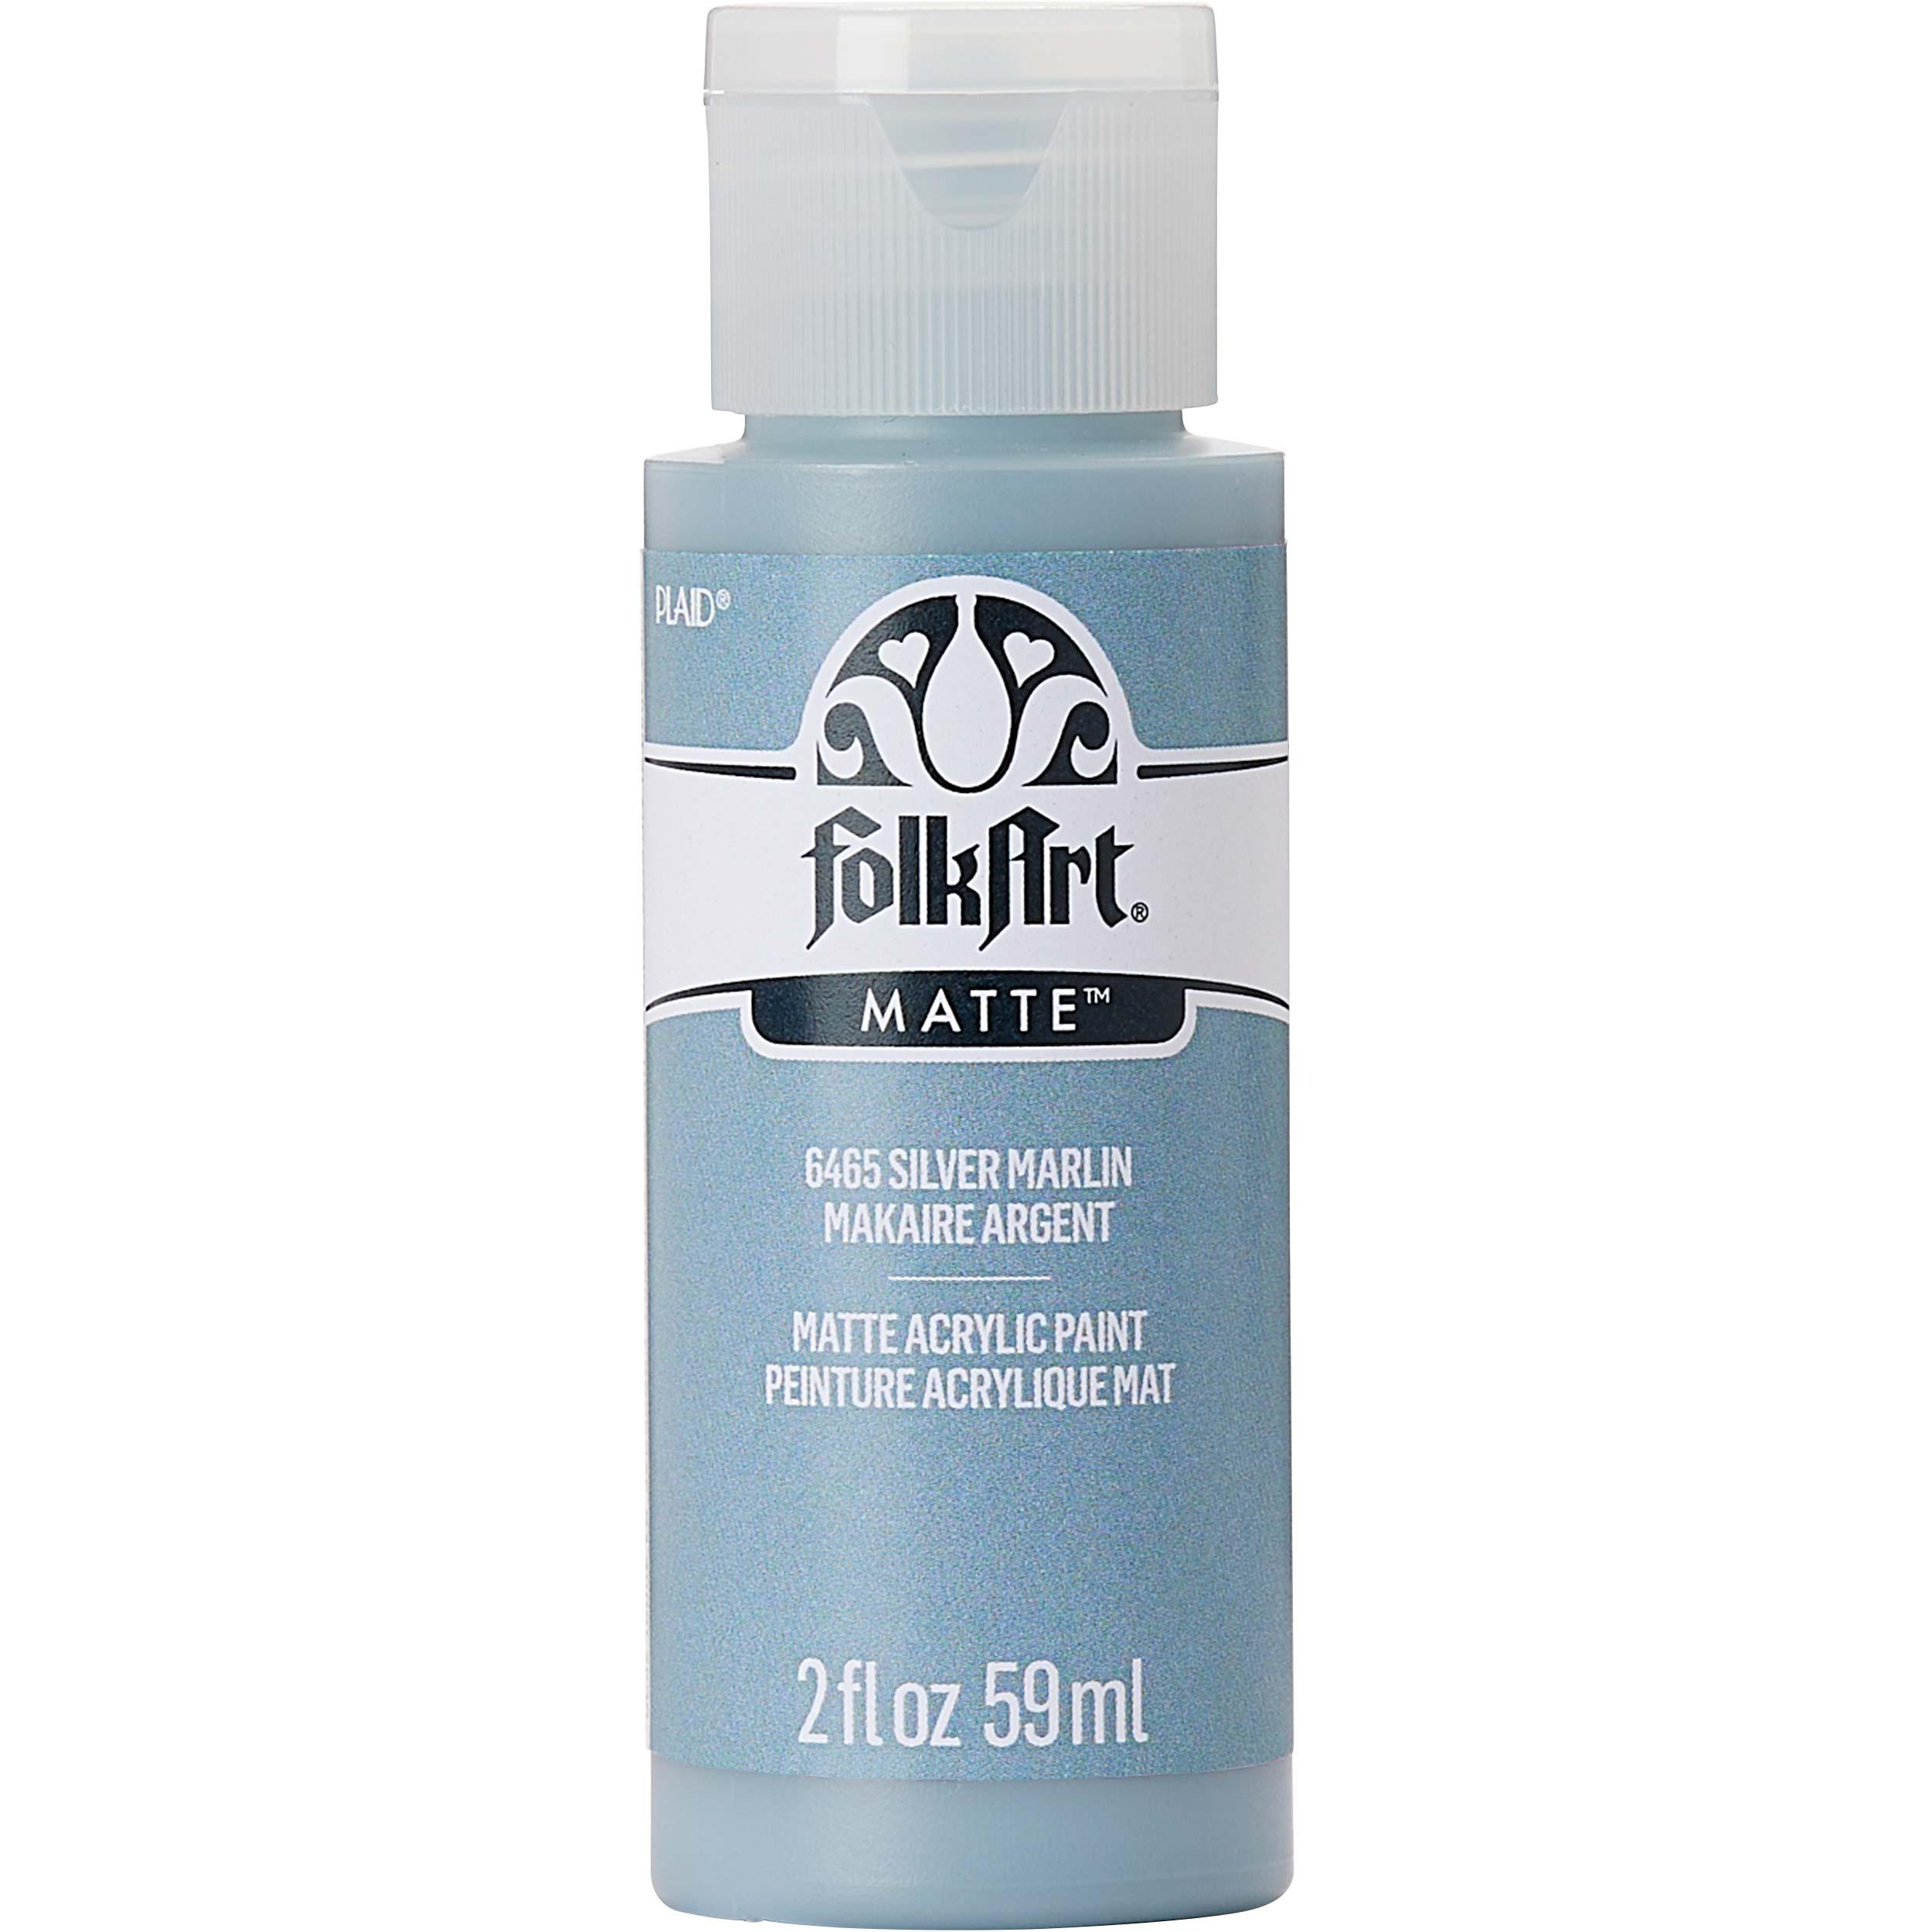 FolkArt ® Acrylic Colors - Silver Marlin, 2 oz. - 6465